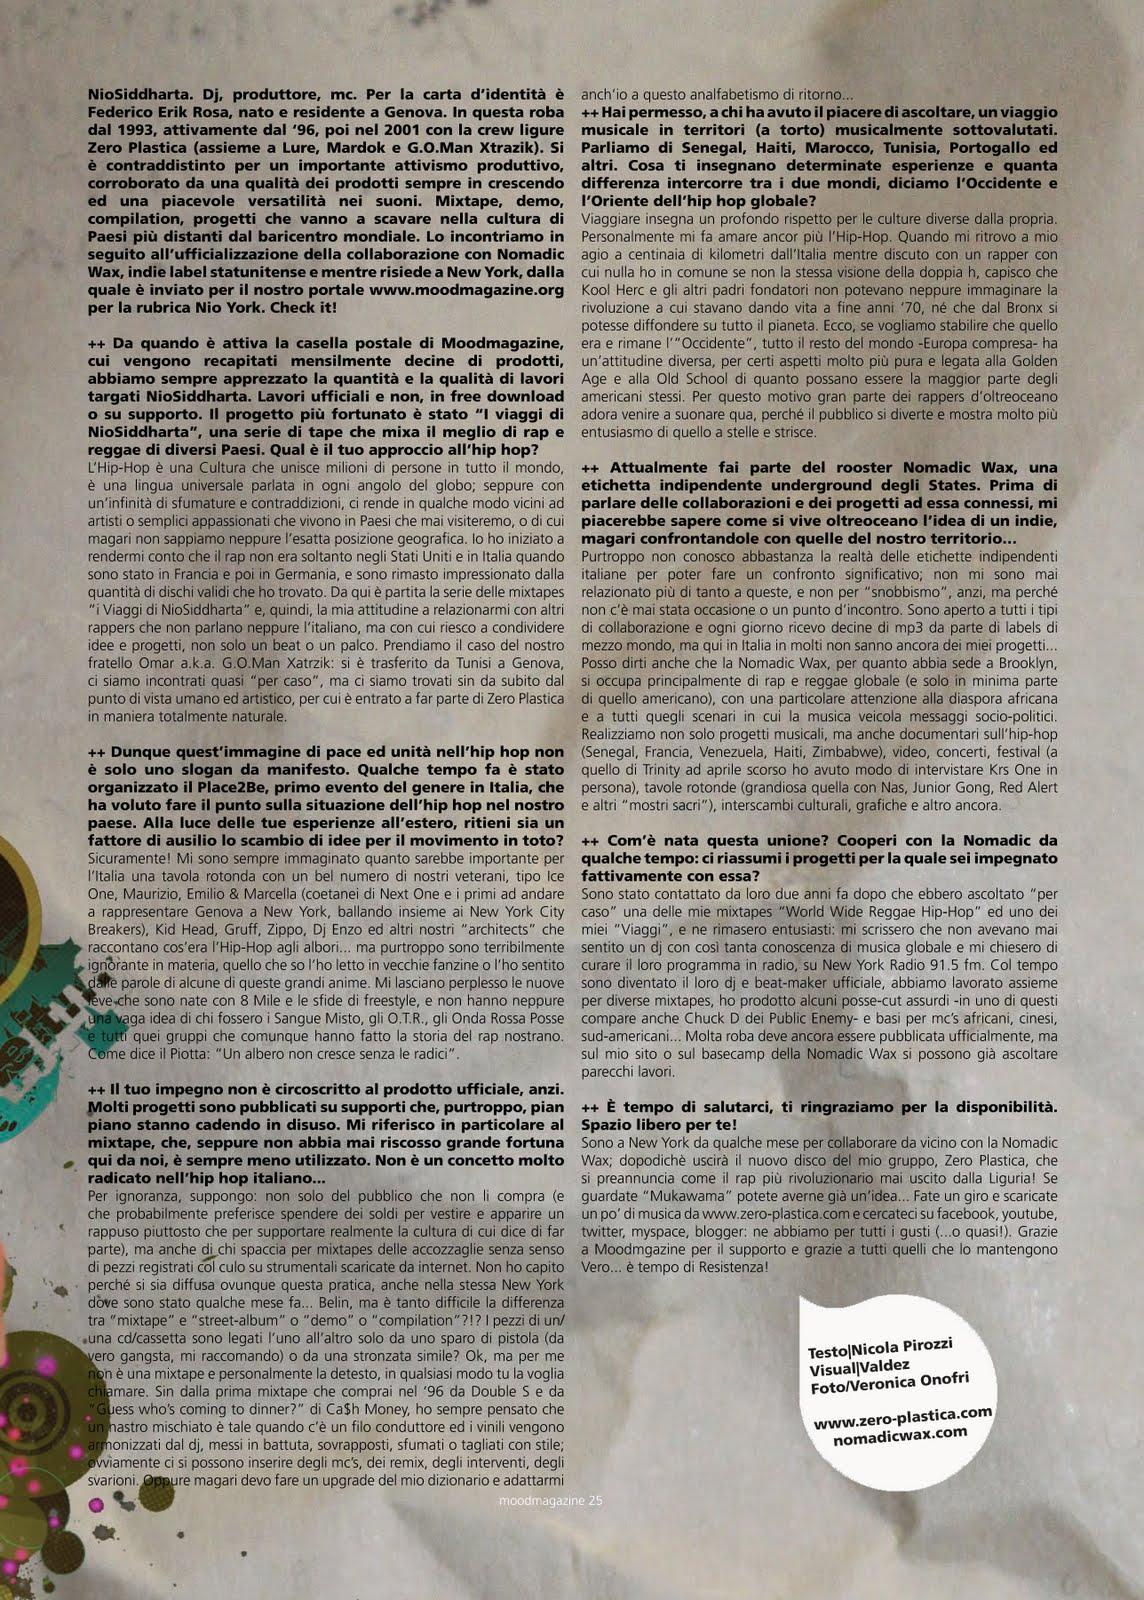 moodmagazine-7_cover_nio-3.jpg